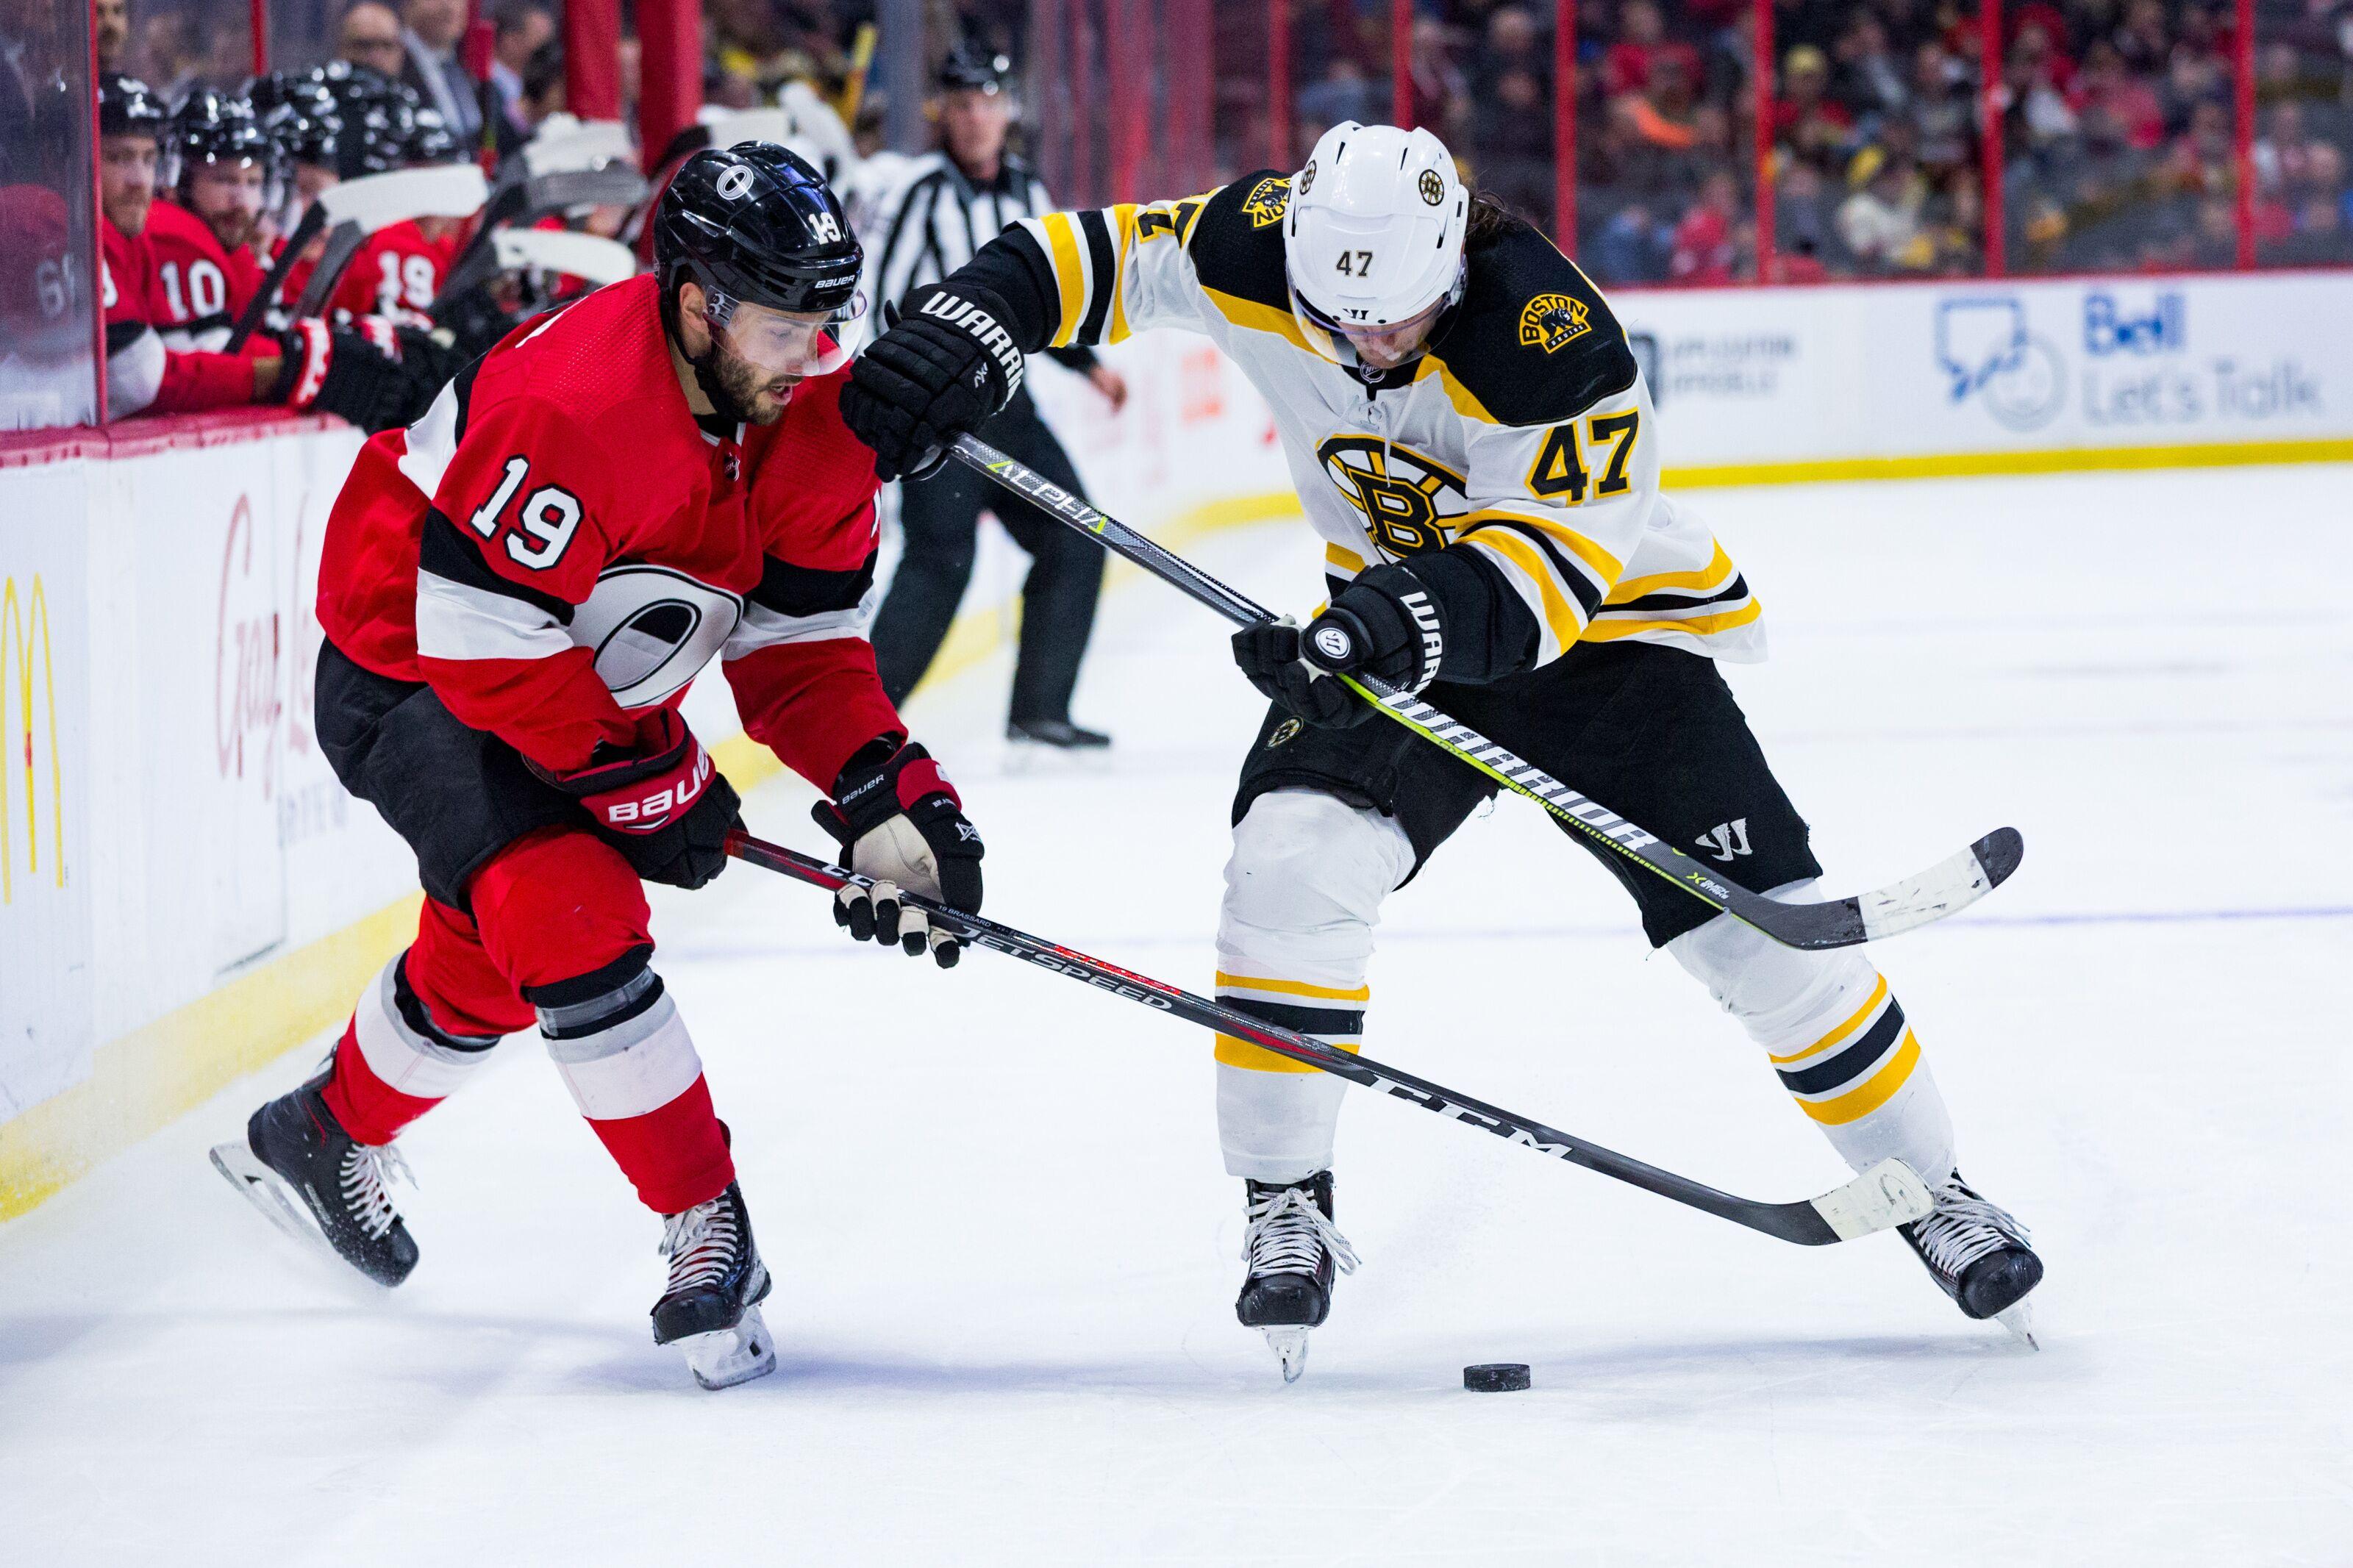 Boston Bruins: Would Derick Brassard have been a smart pick-up?